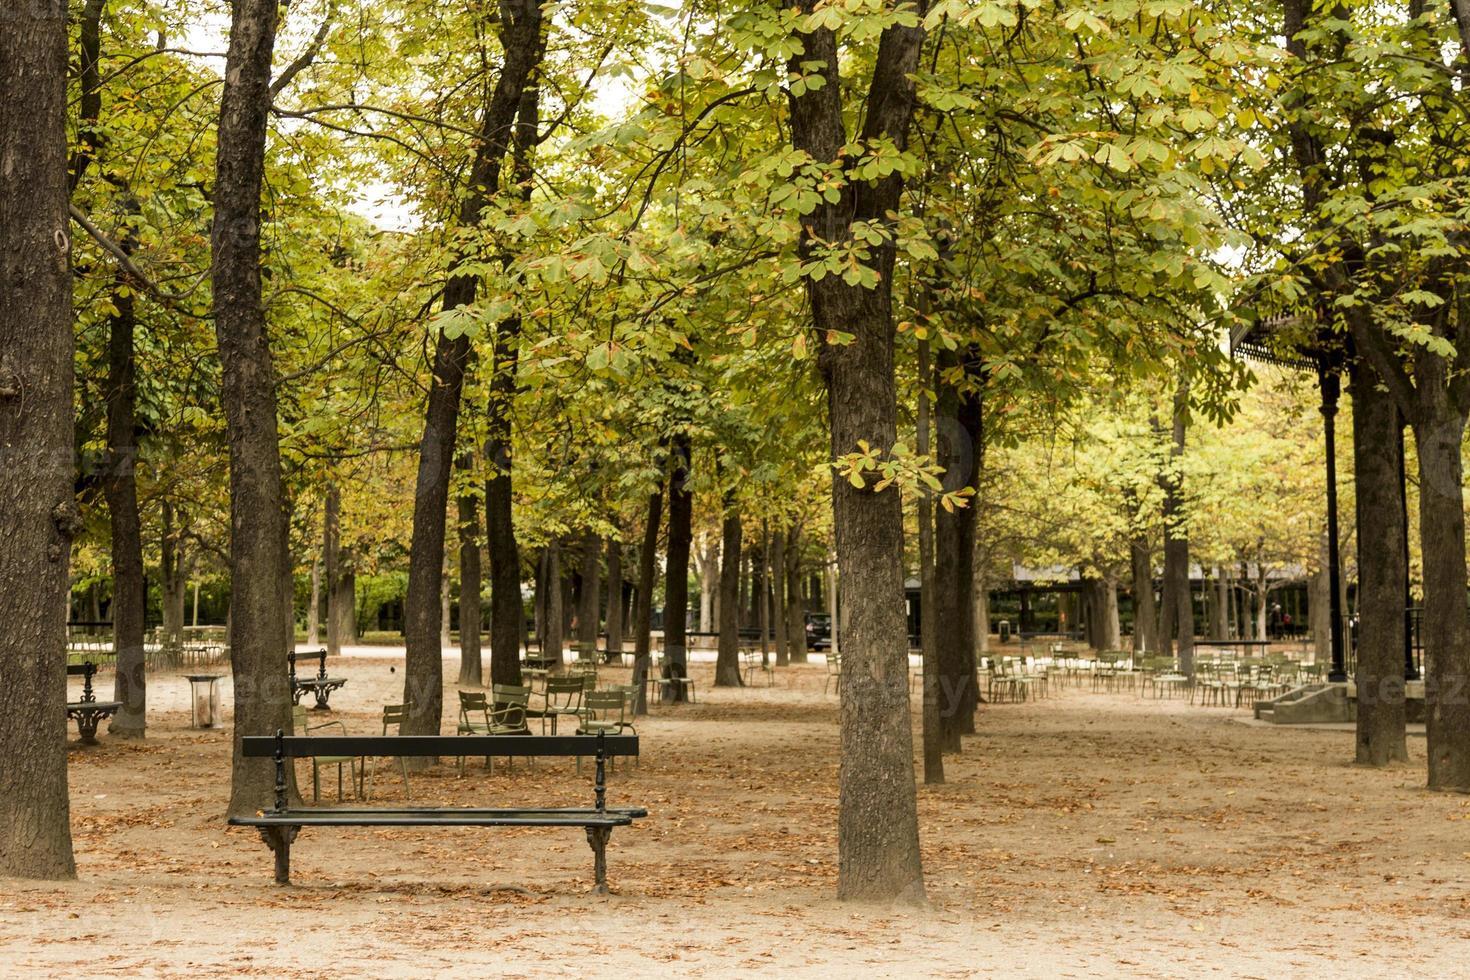 Park bench in Paris photo